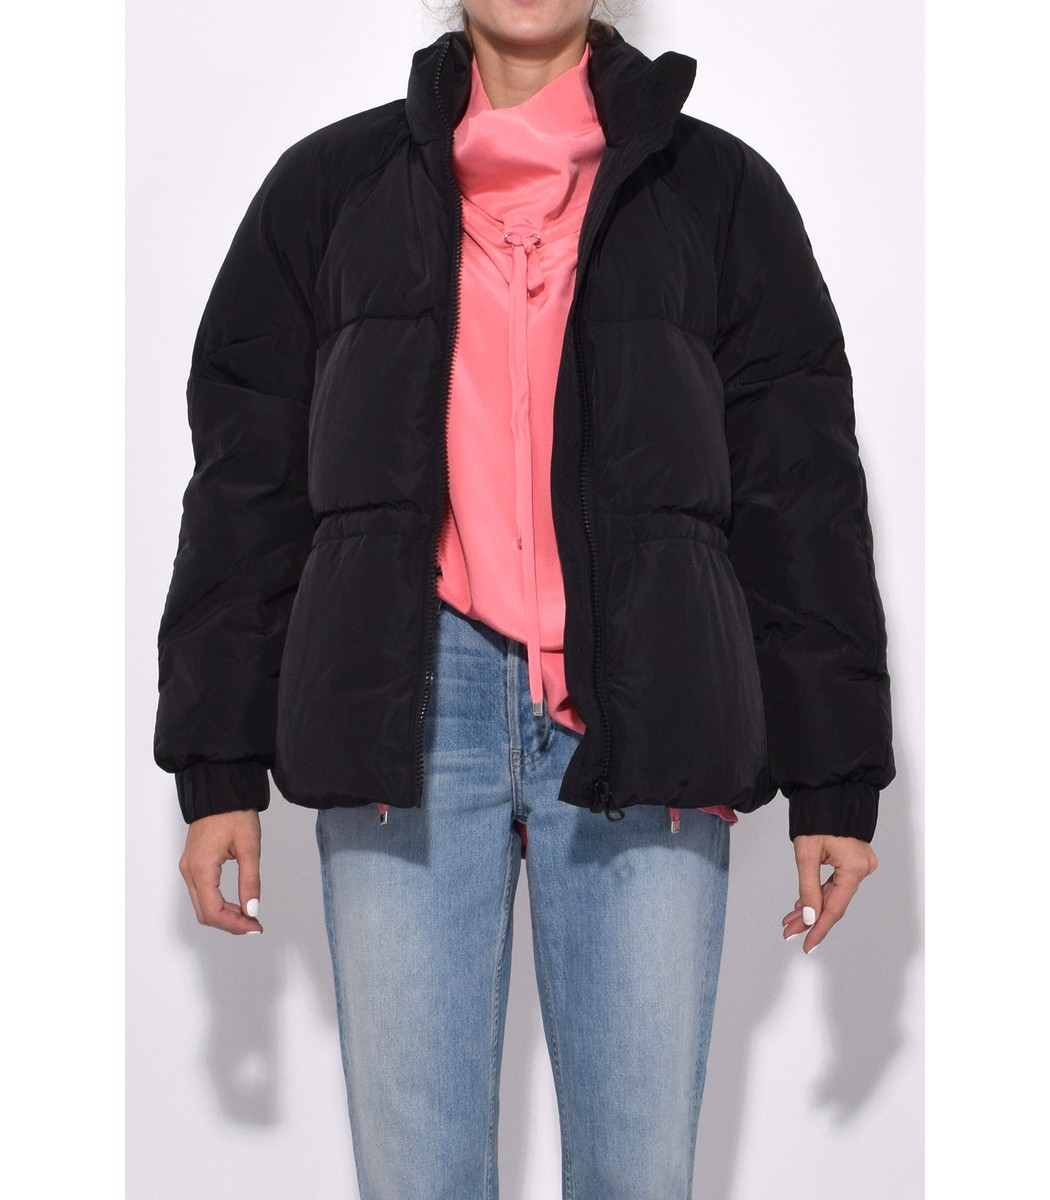 GANNI Downs Whitman Jacket in Black